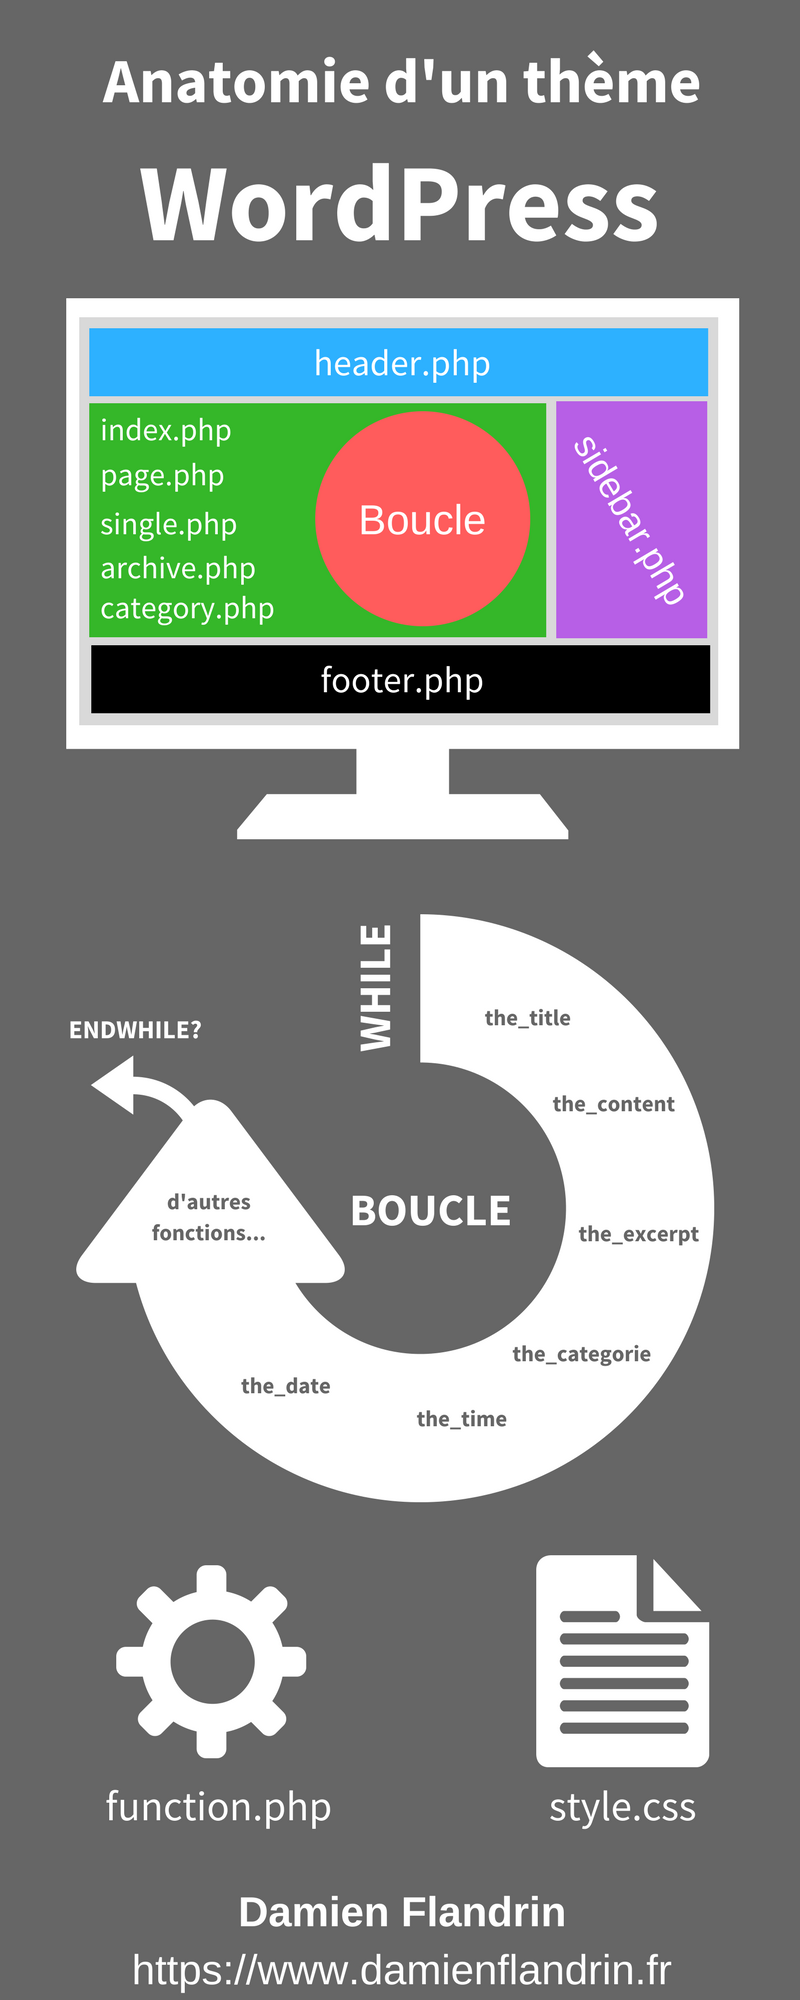 Anatomie d\'un thème Wordpress | Articles - damienflandrin.fr ...